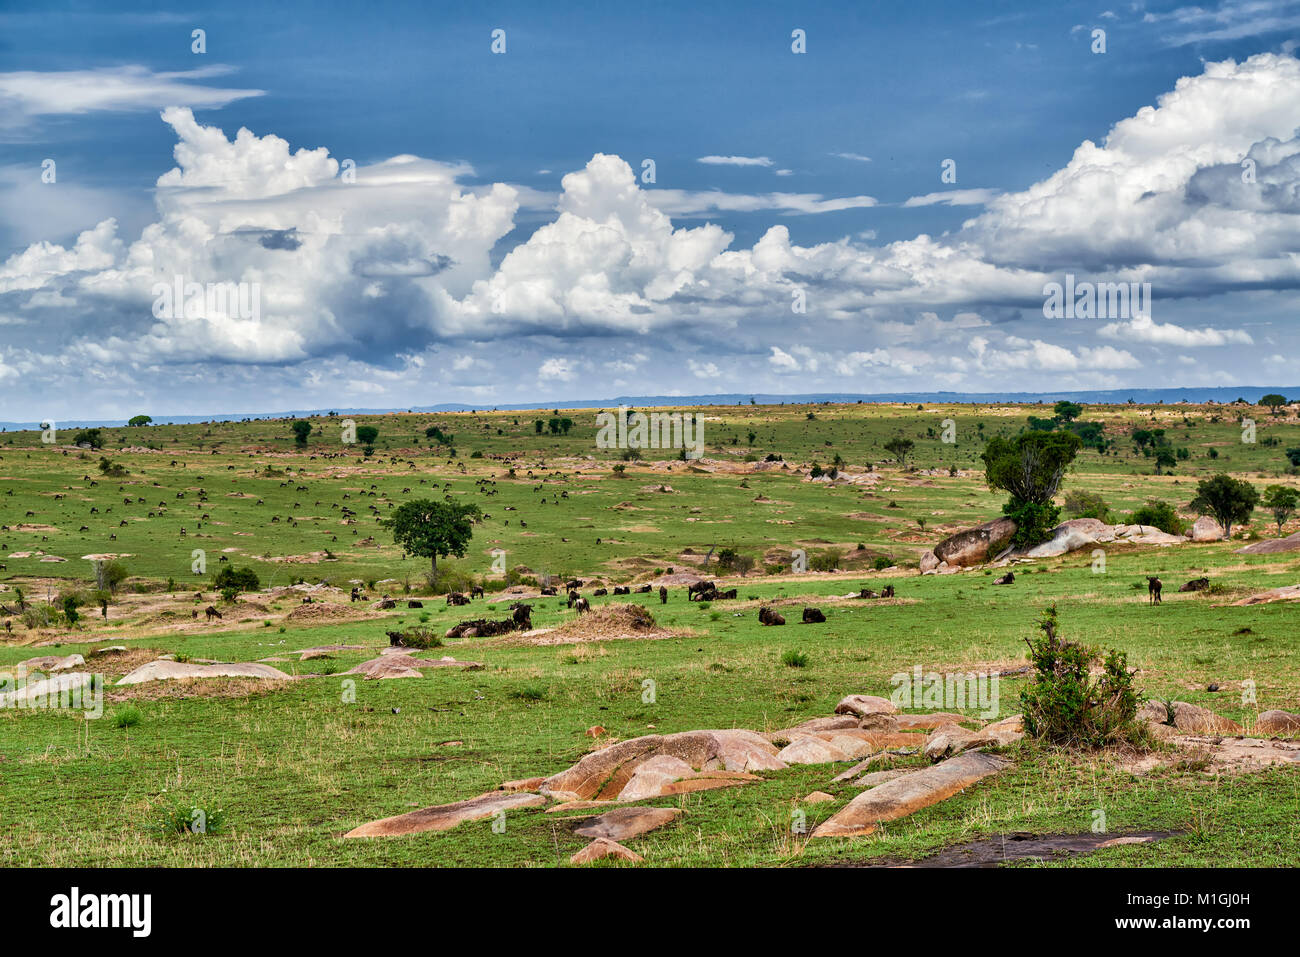 landscape with wildebeest in Serengeti National Park, UNESCO world heritage site, Tanzania, Africa - Stock Image